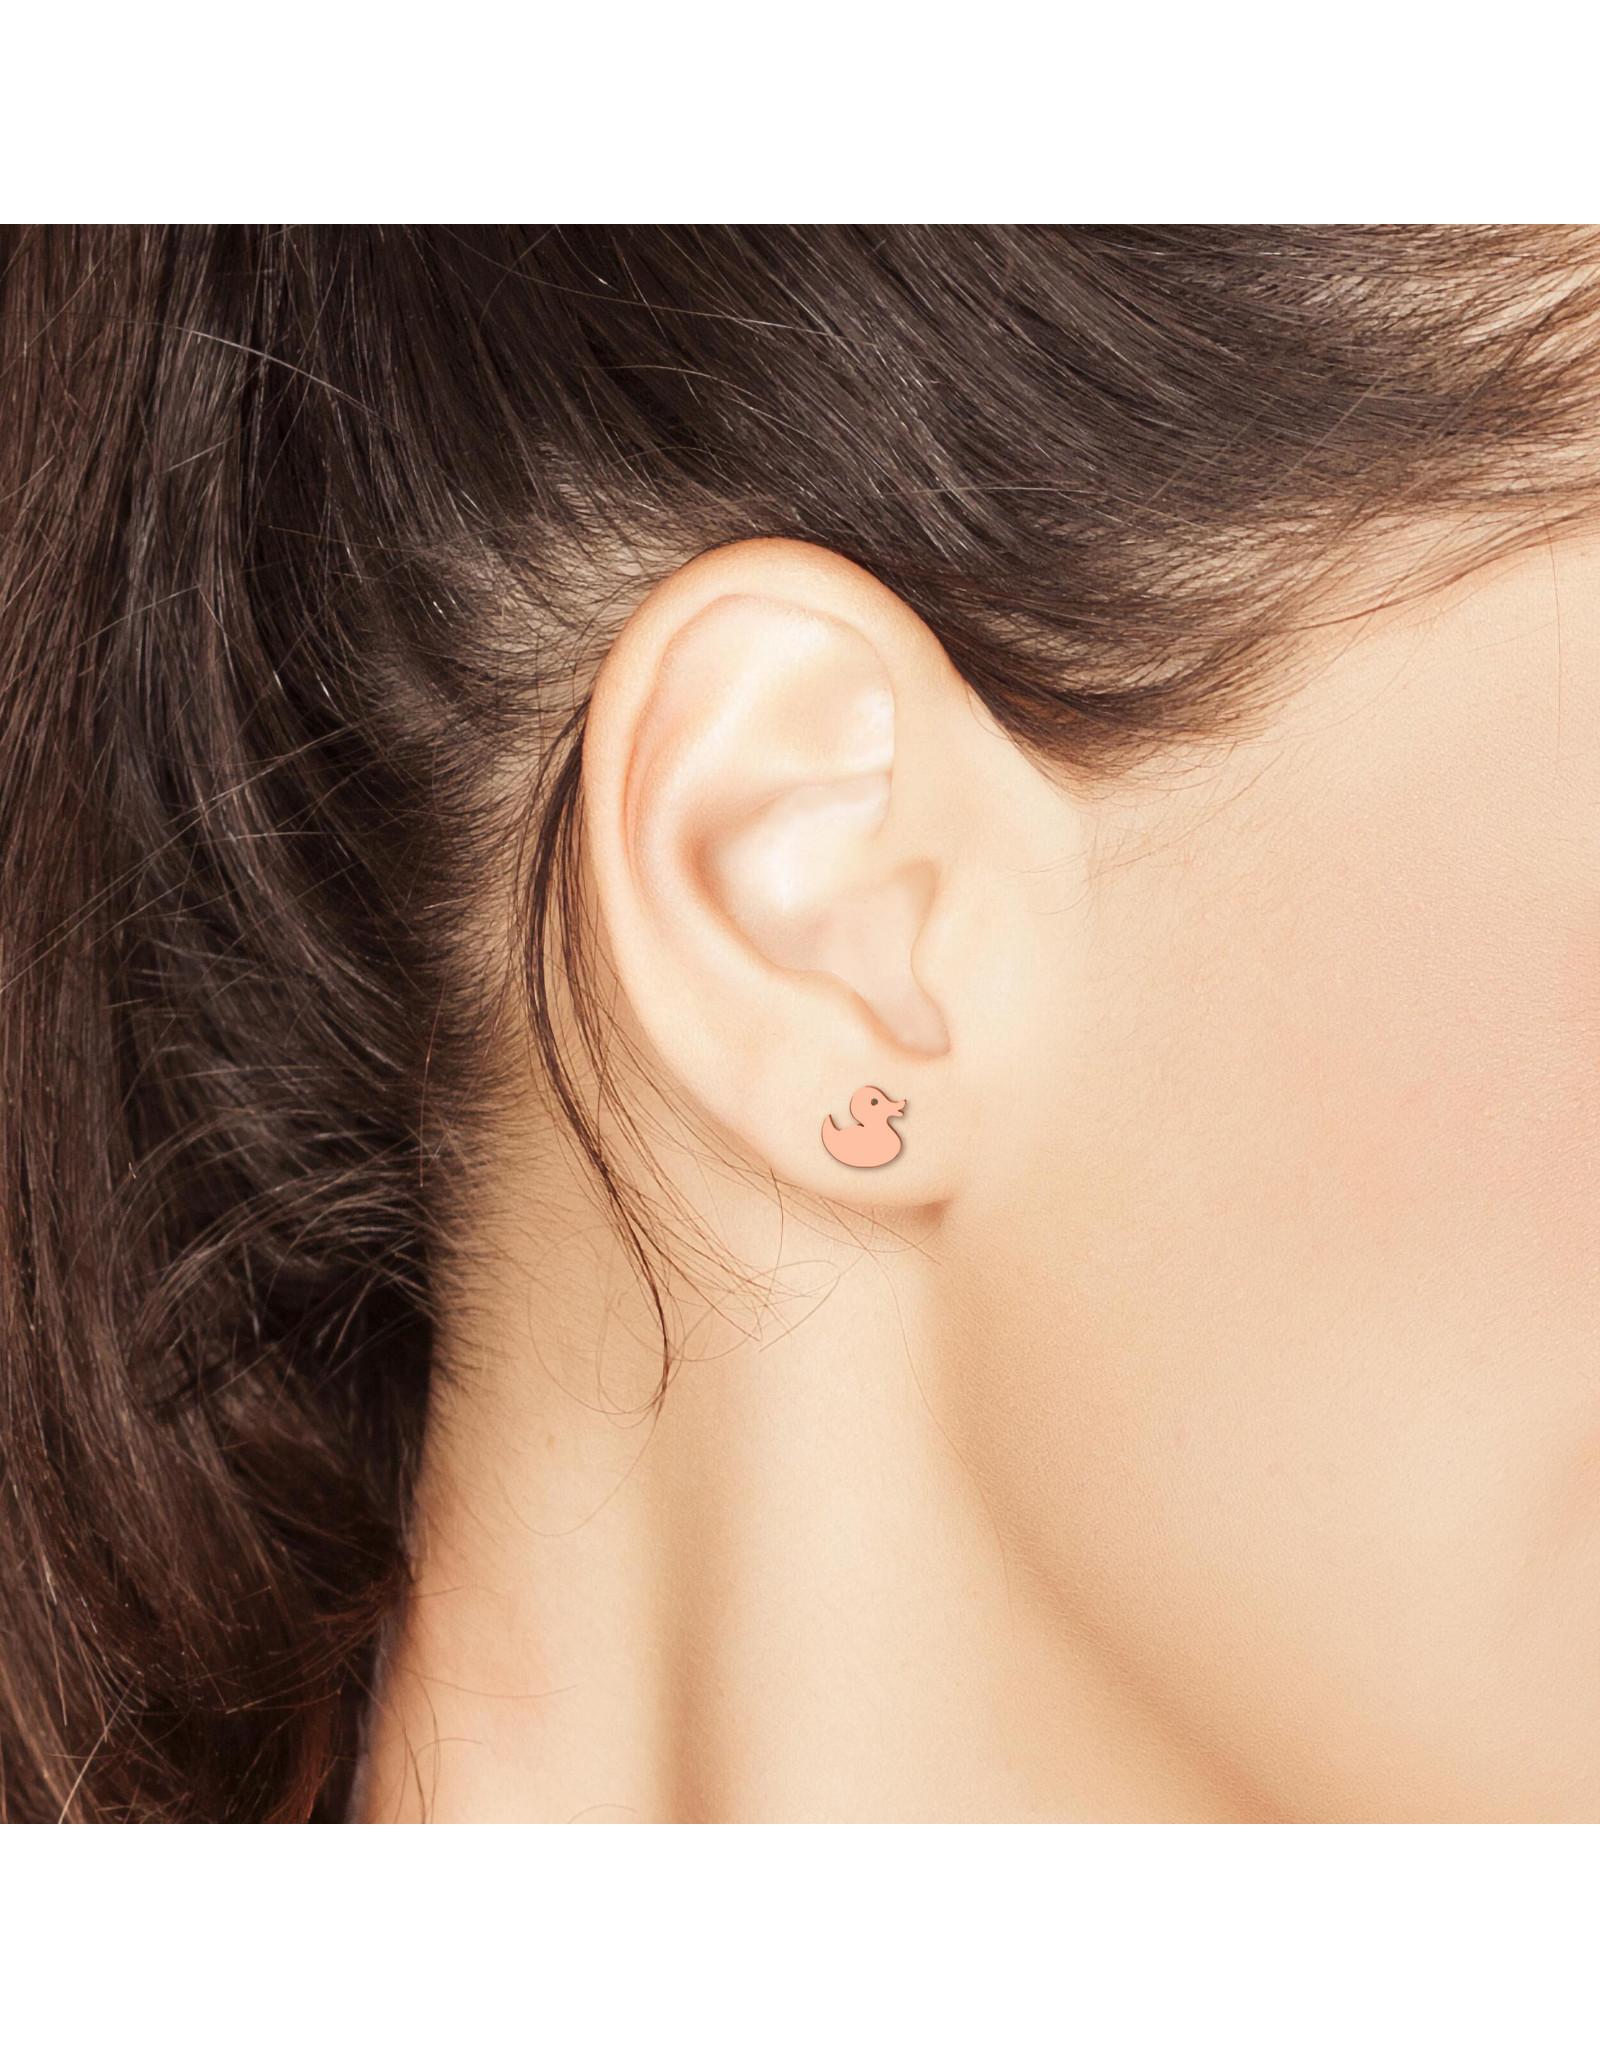 Rubber Duck Earrings - Rose Gold